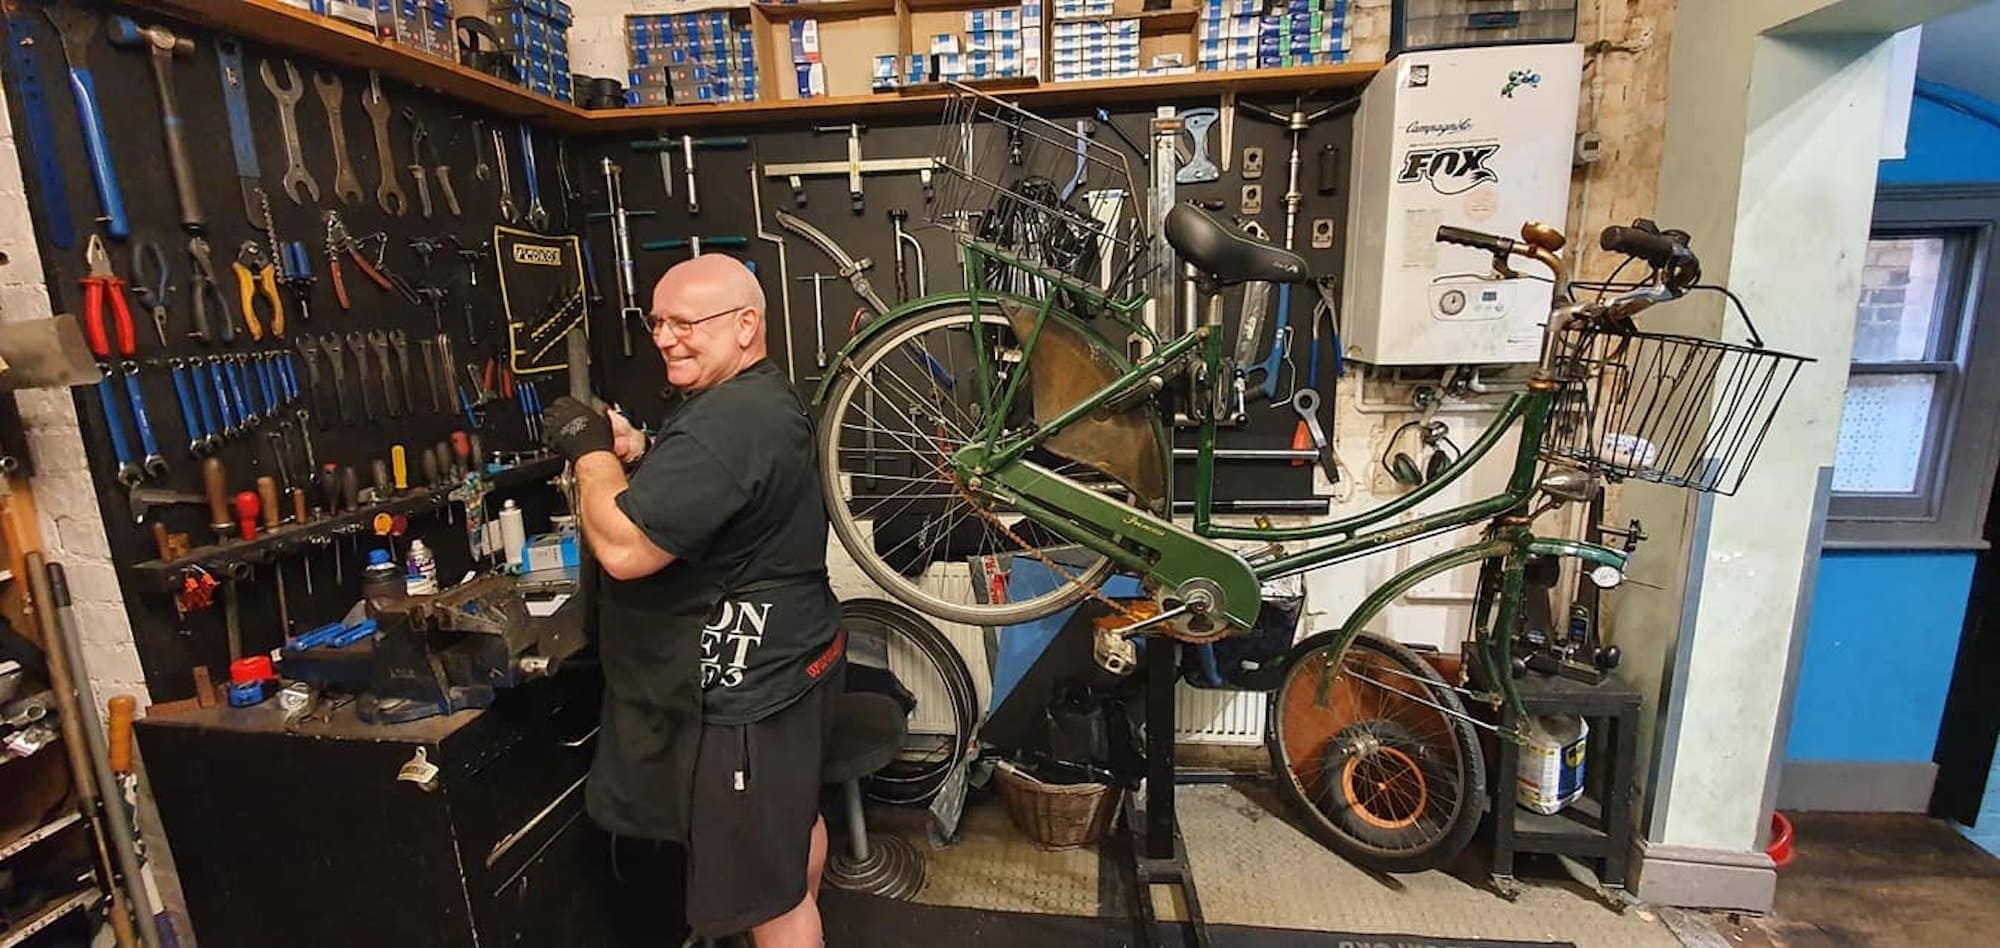 How often should I get my bike serviced?